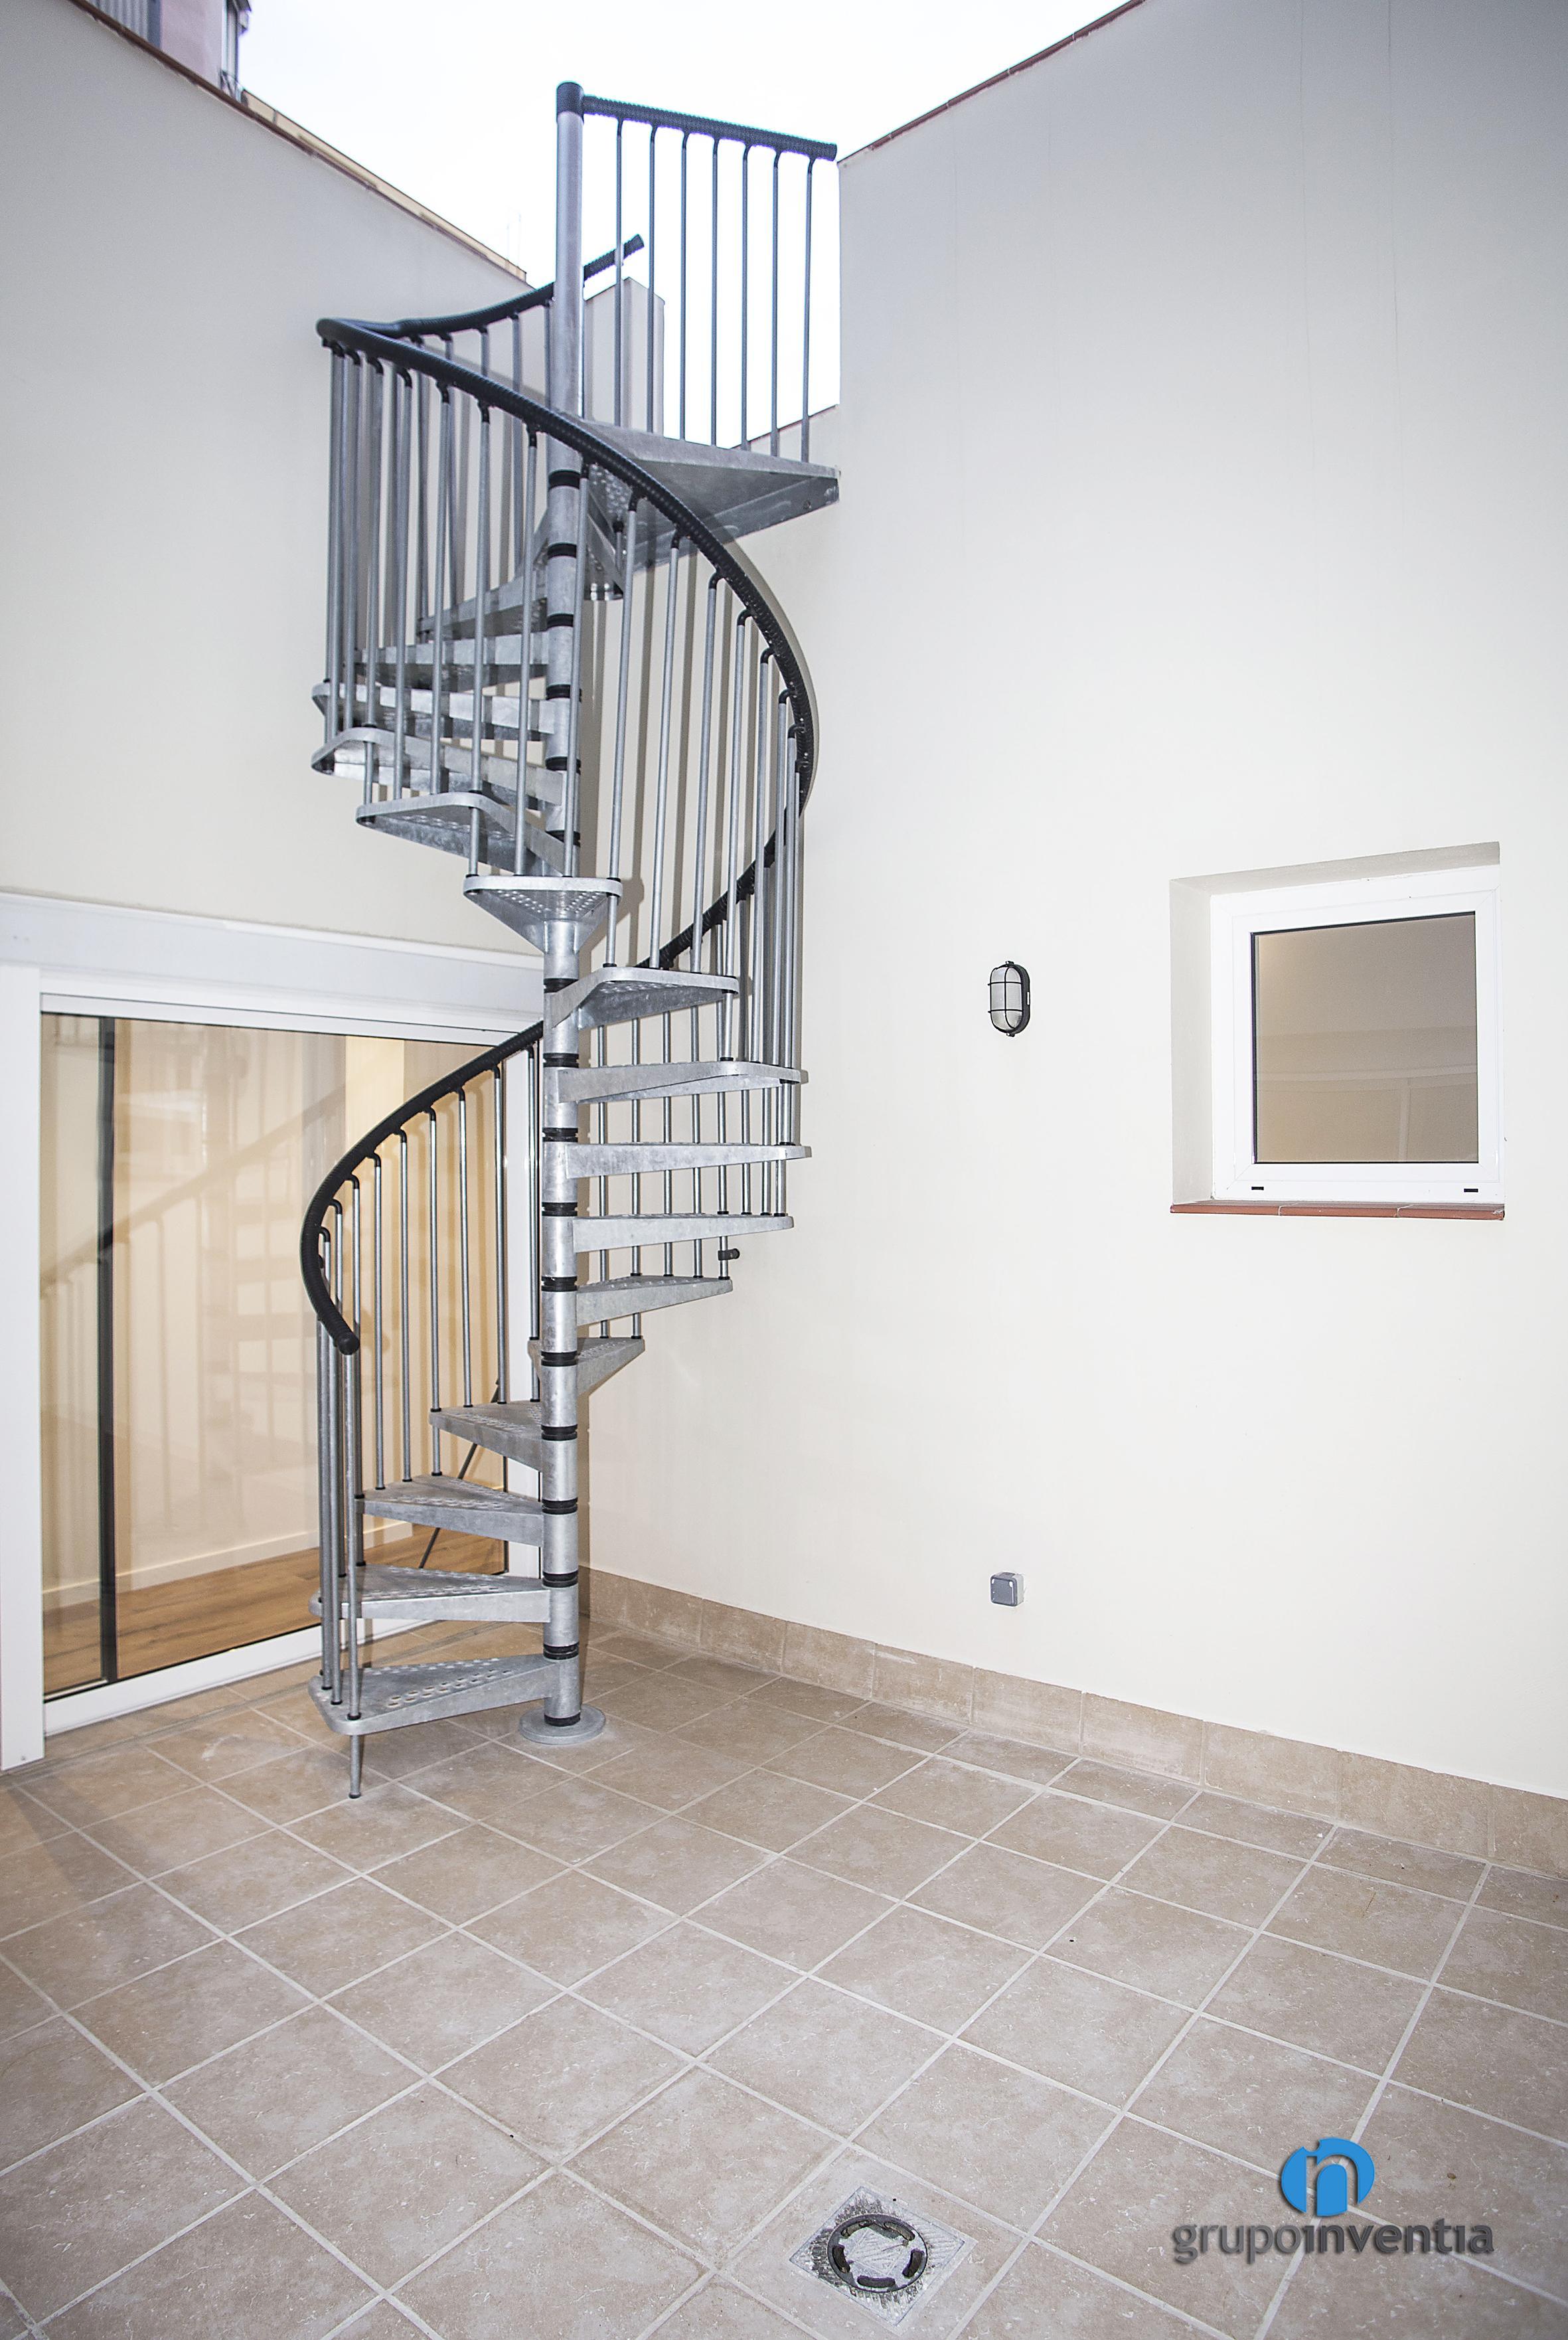 Escalera de caracol en calle p via de barcelona grupo inventia - Escaleras de caracol barcelona ...